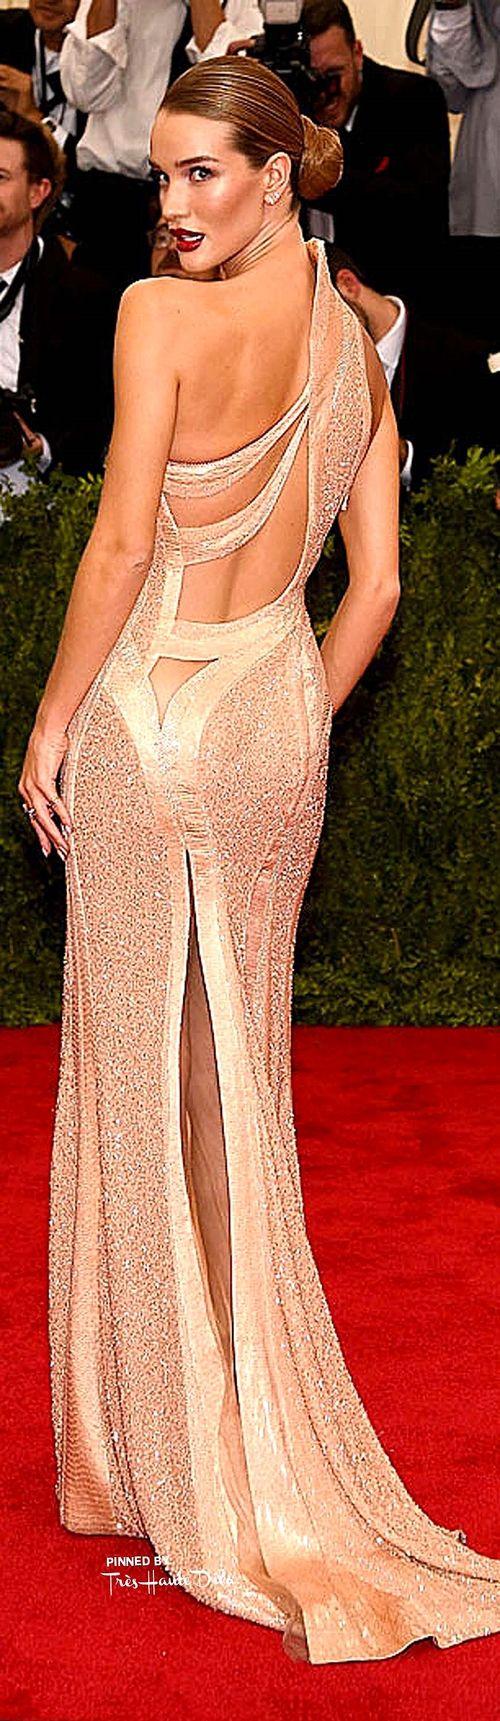 Versace wedding dress  Рози ХантингтонУайтли в Atelier Versace  Versace Design